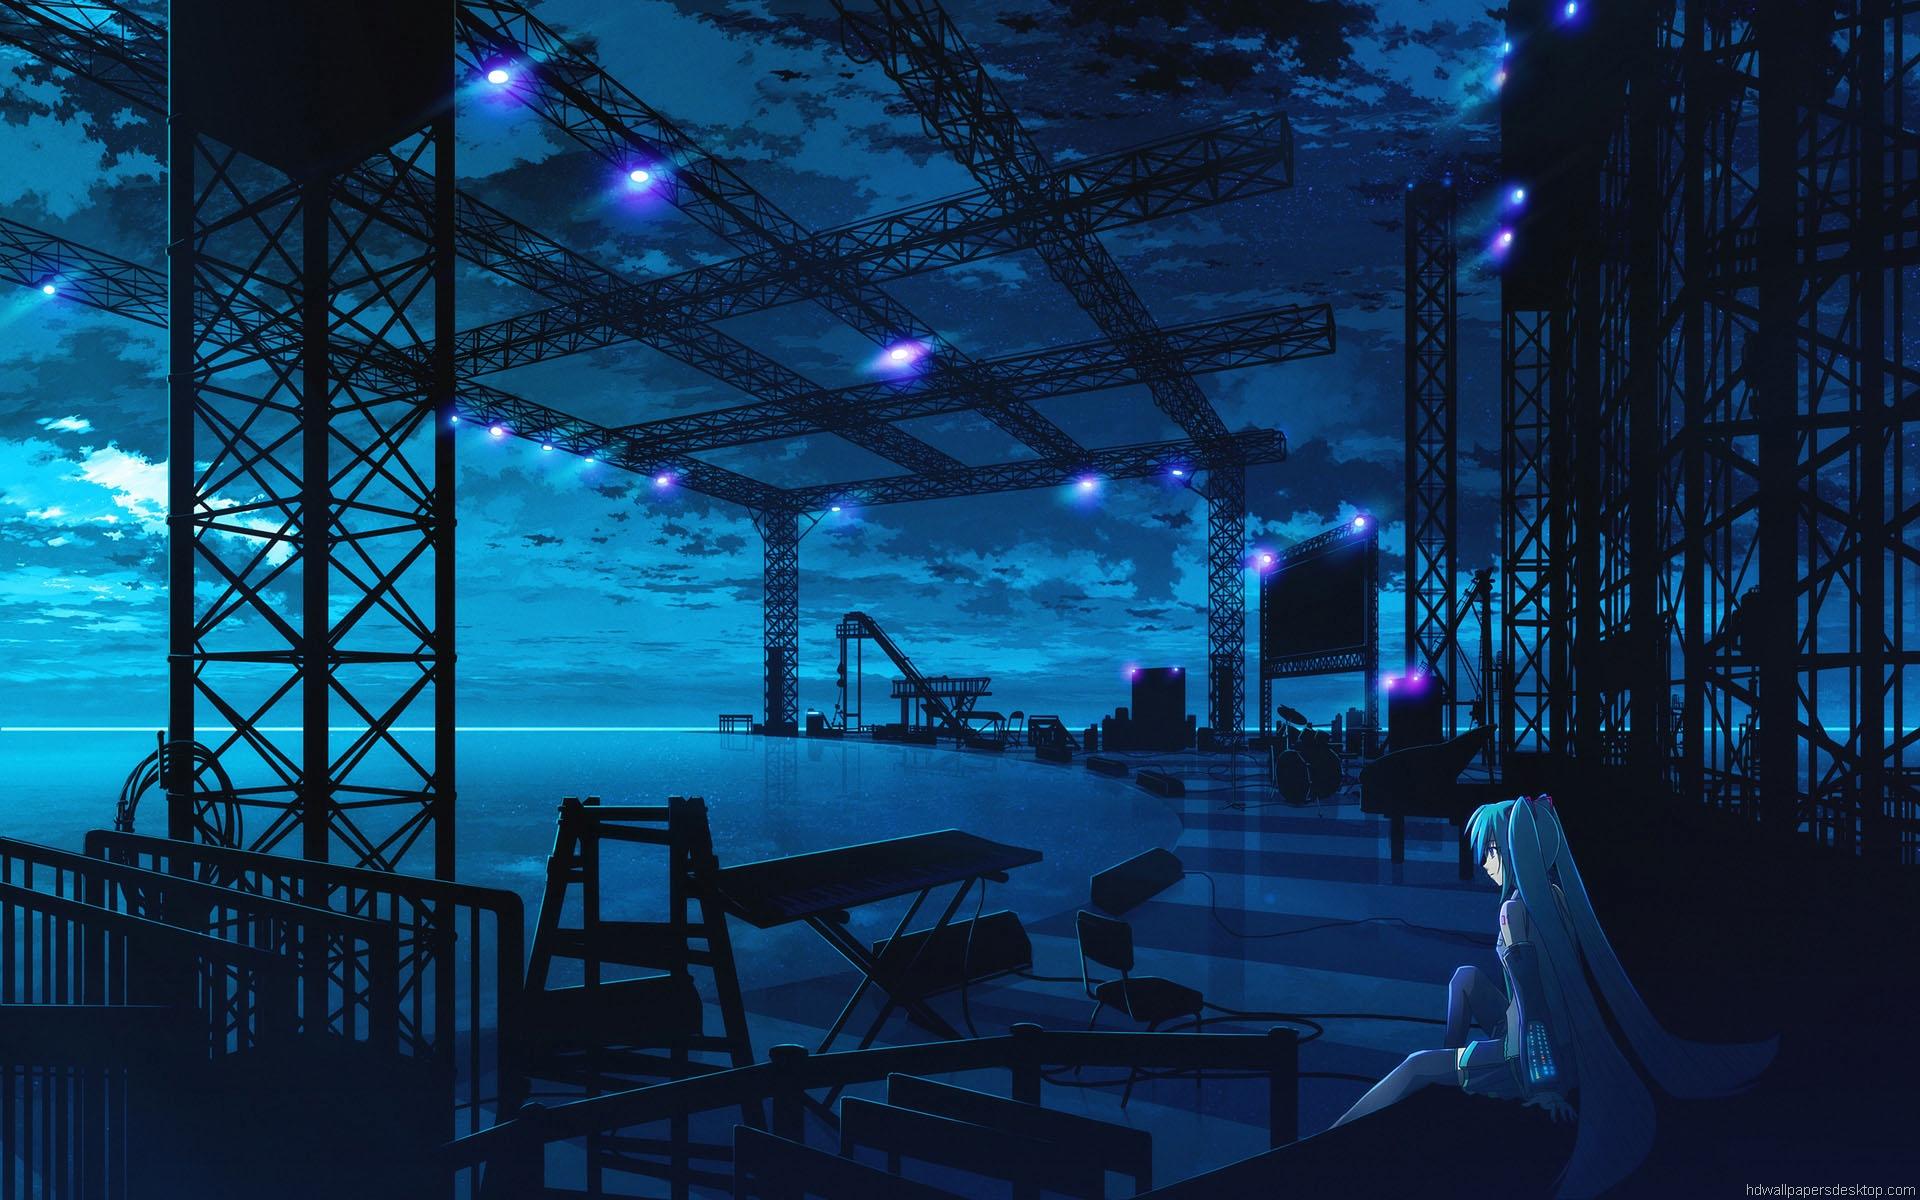 Anime HD Wallpapers HD Widescreen Desktop Wallpapers 1920x1200